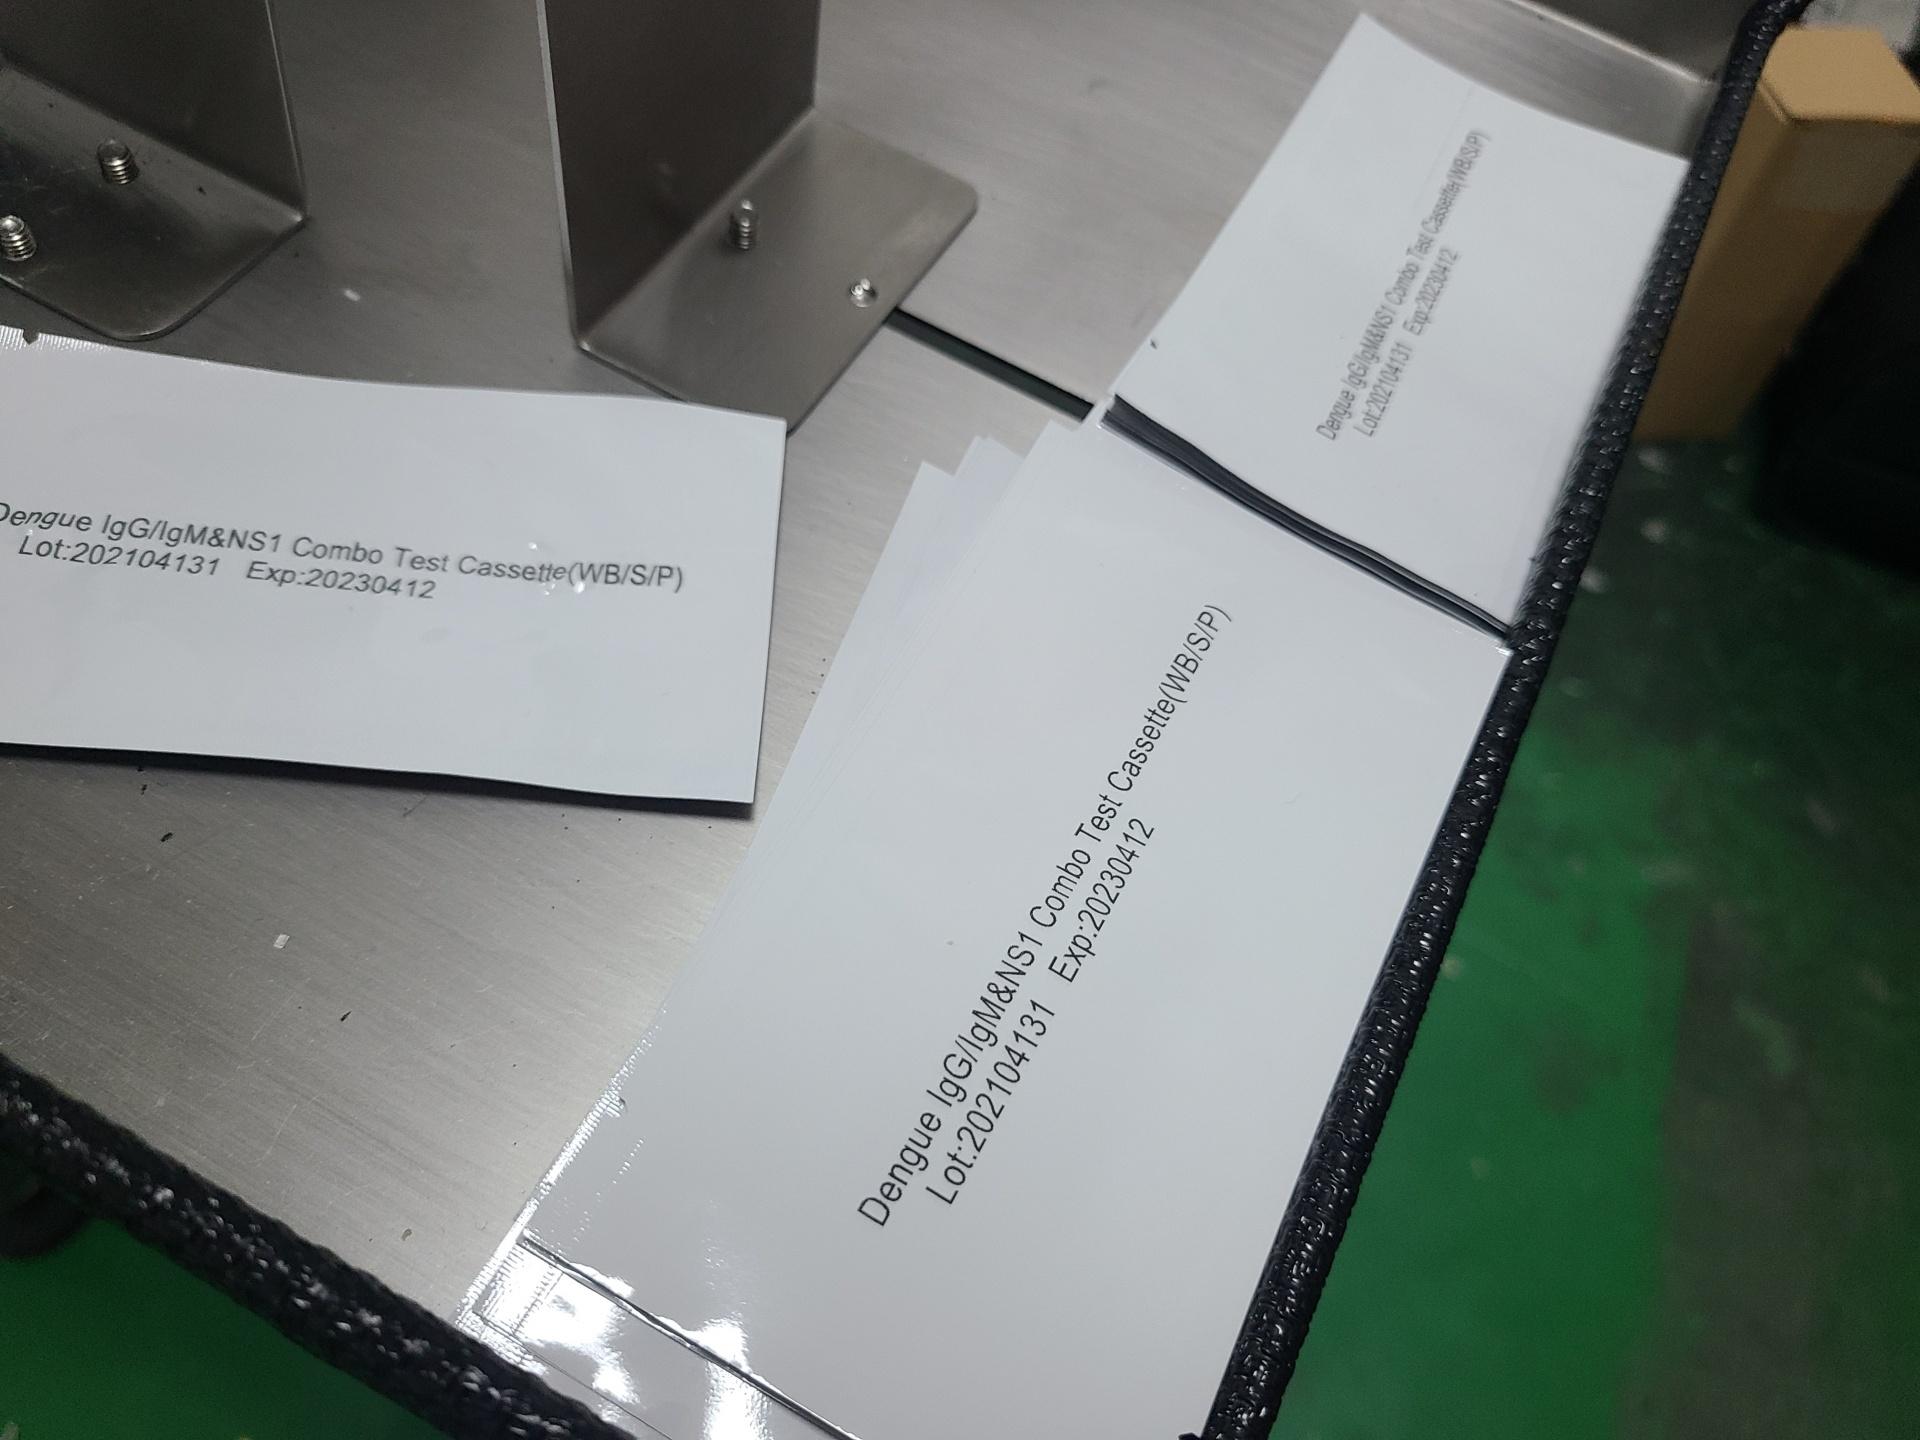 UV喷码机 检测试剂袋喷印 应用视频